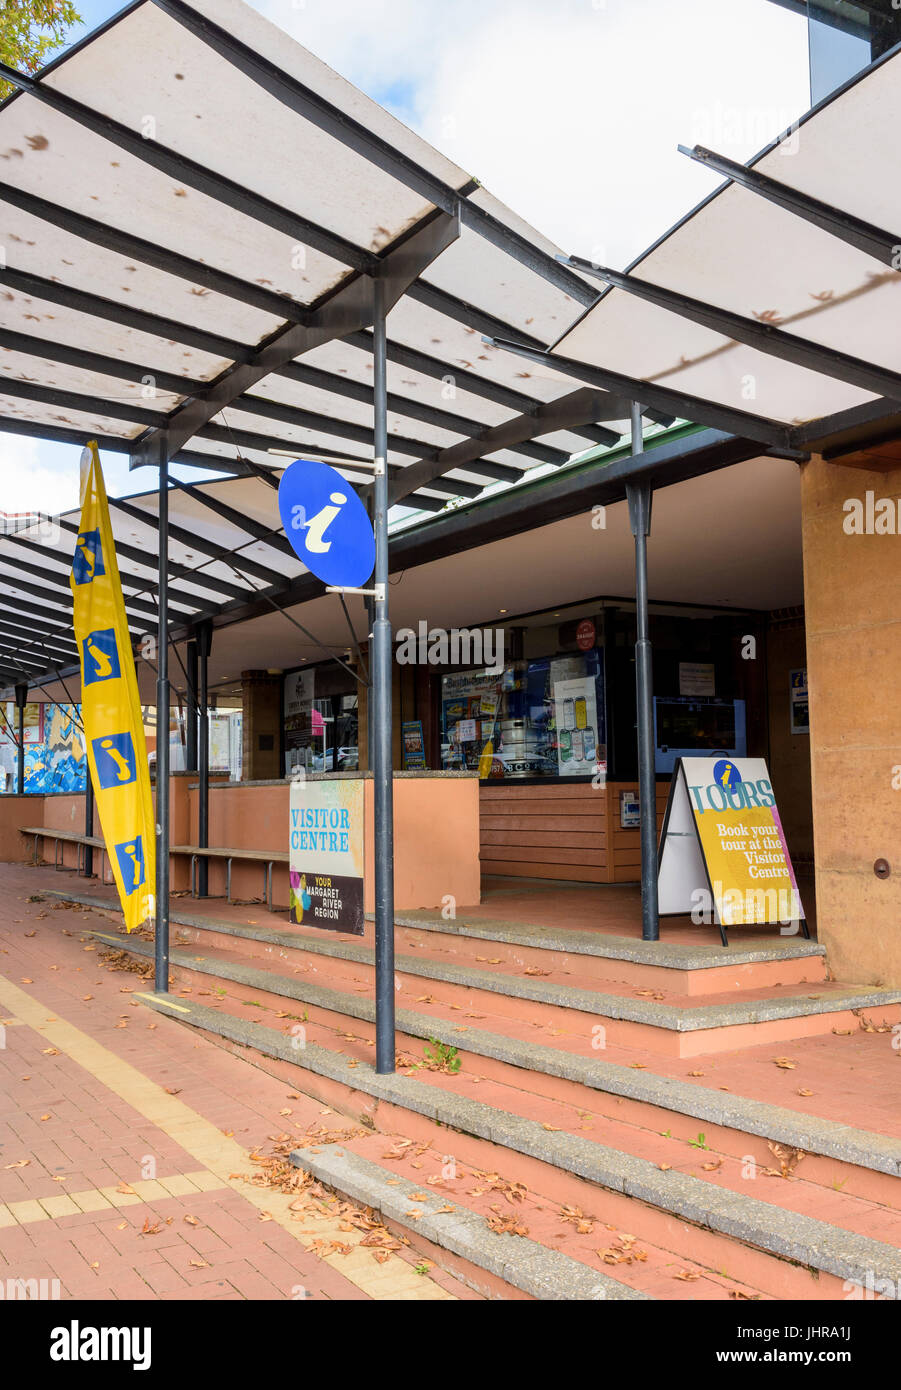 Margaret River Visitor Centre in Margaret River town, Western Australia - Stock Image